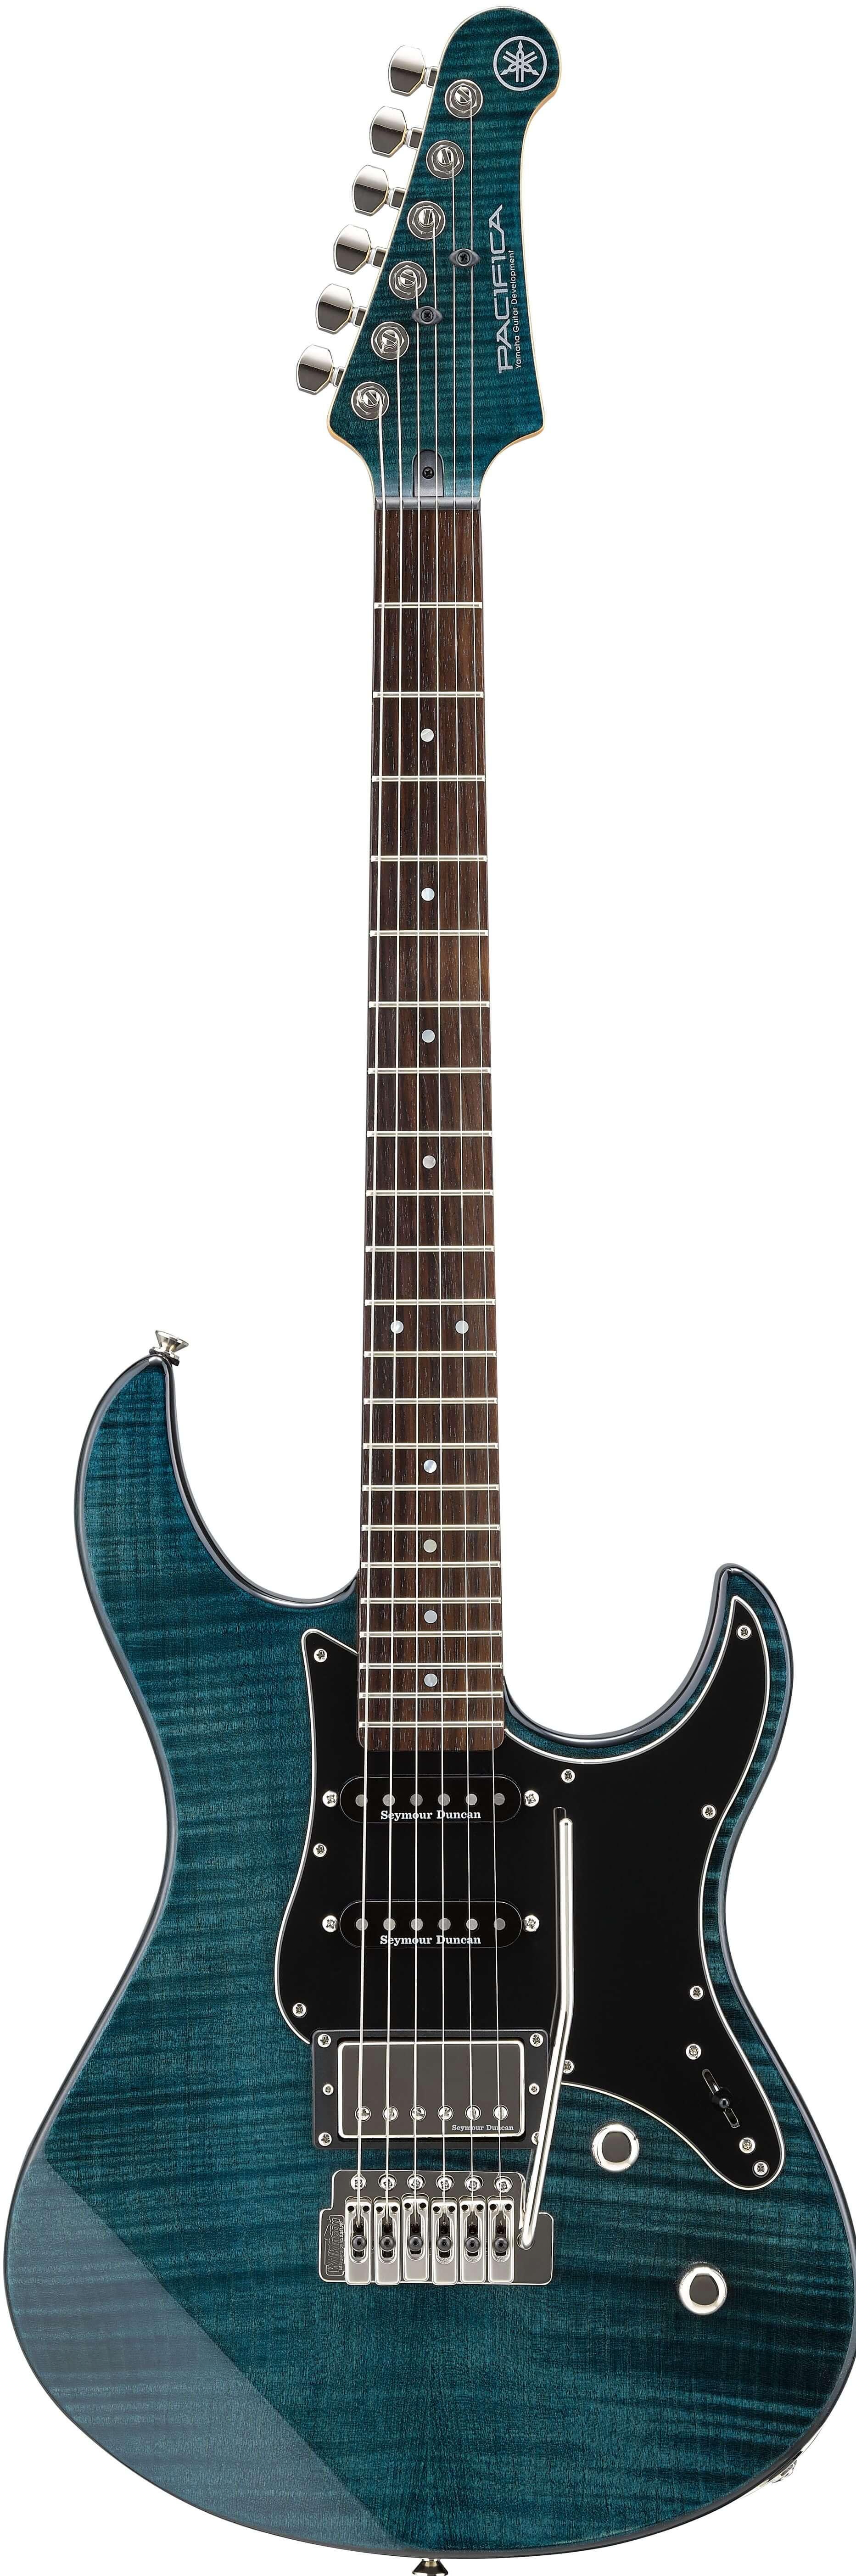 Guitarra Eléctrica Yamaha Pa612VIIFMIDB Indigo Blue